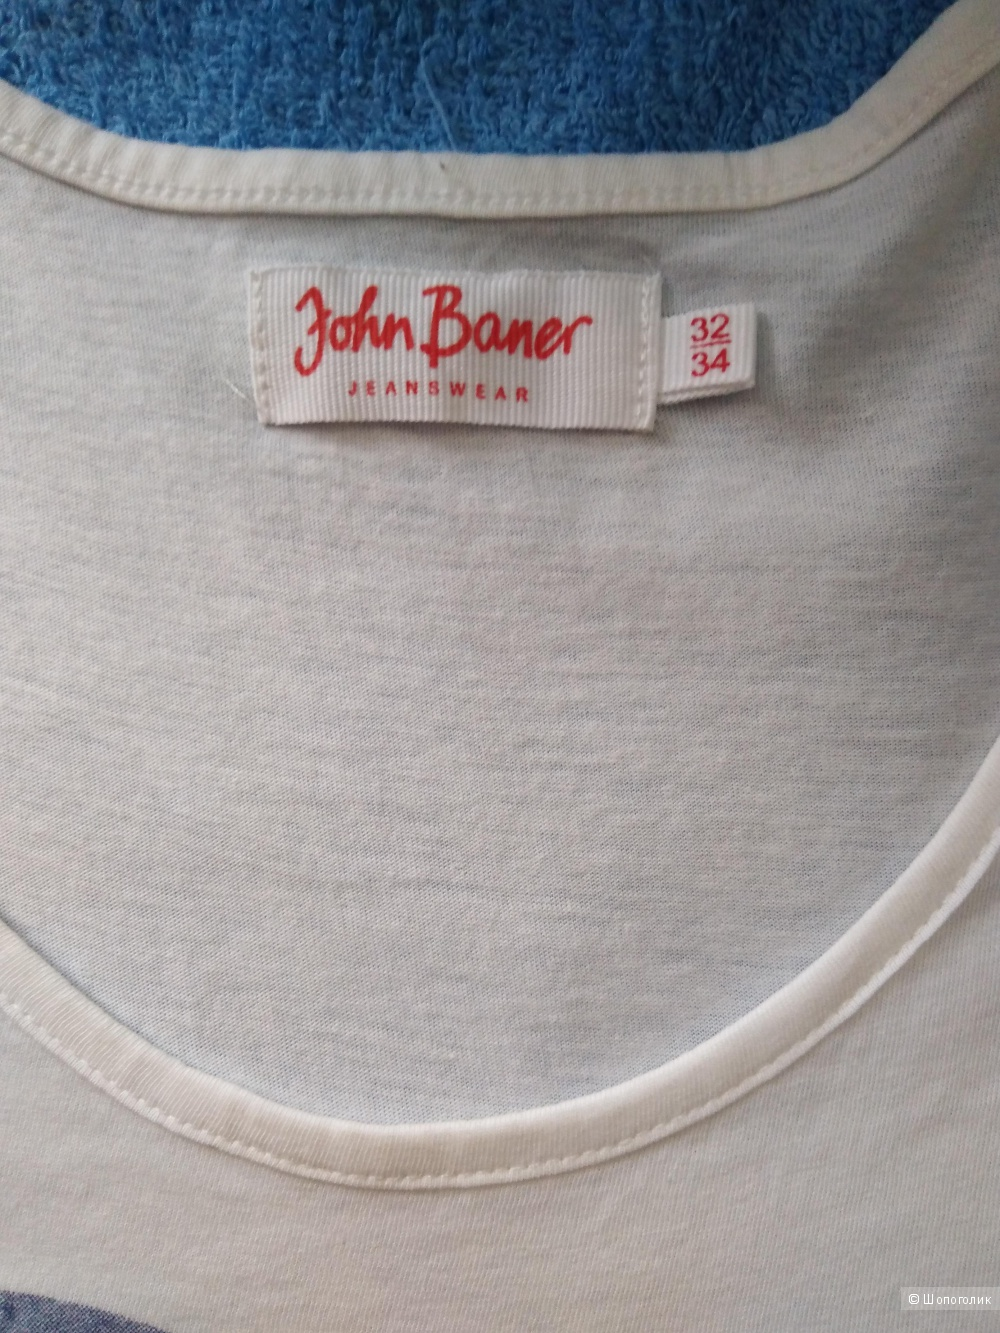 Футболка. John Baner. Р-р 32/34.